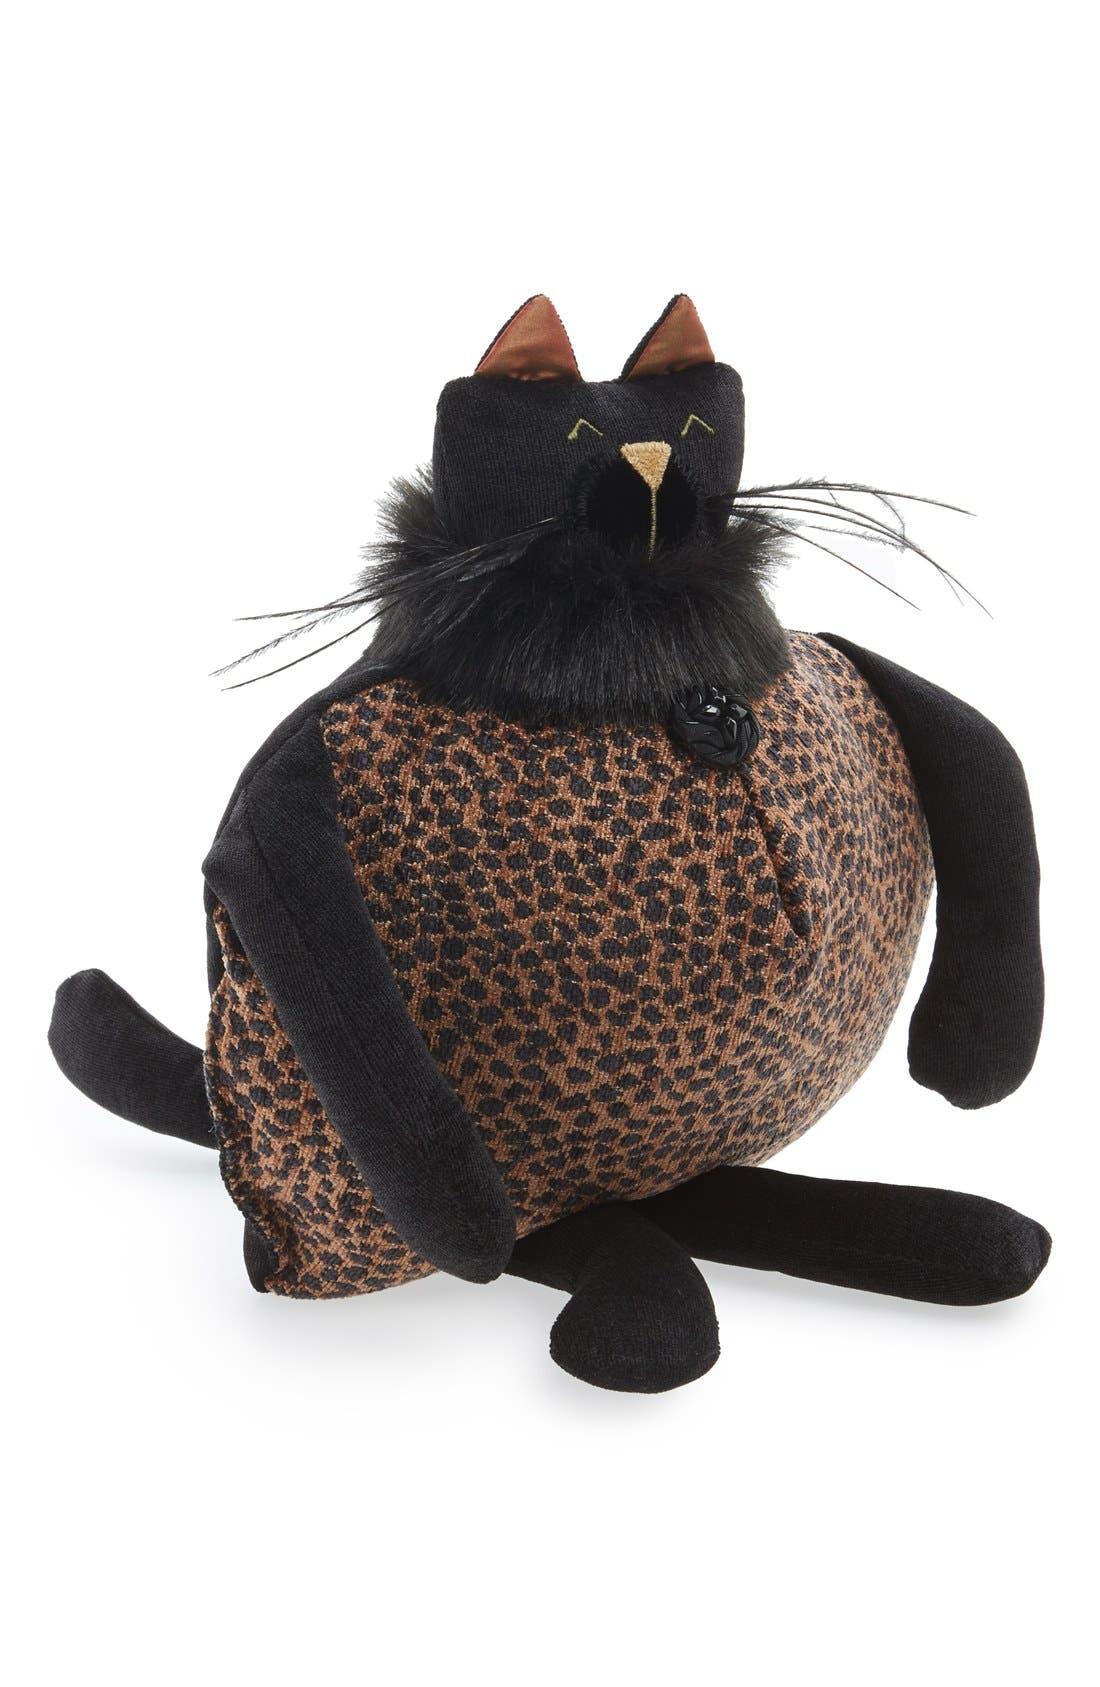 Main Image - Woof & Poof Fat Cat Decoration